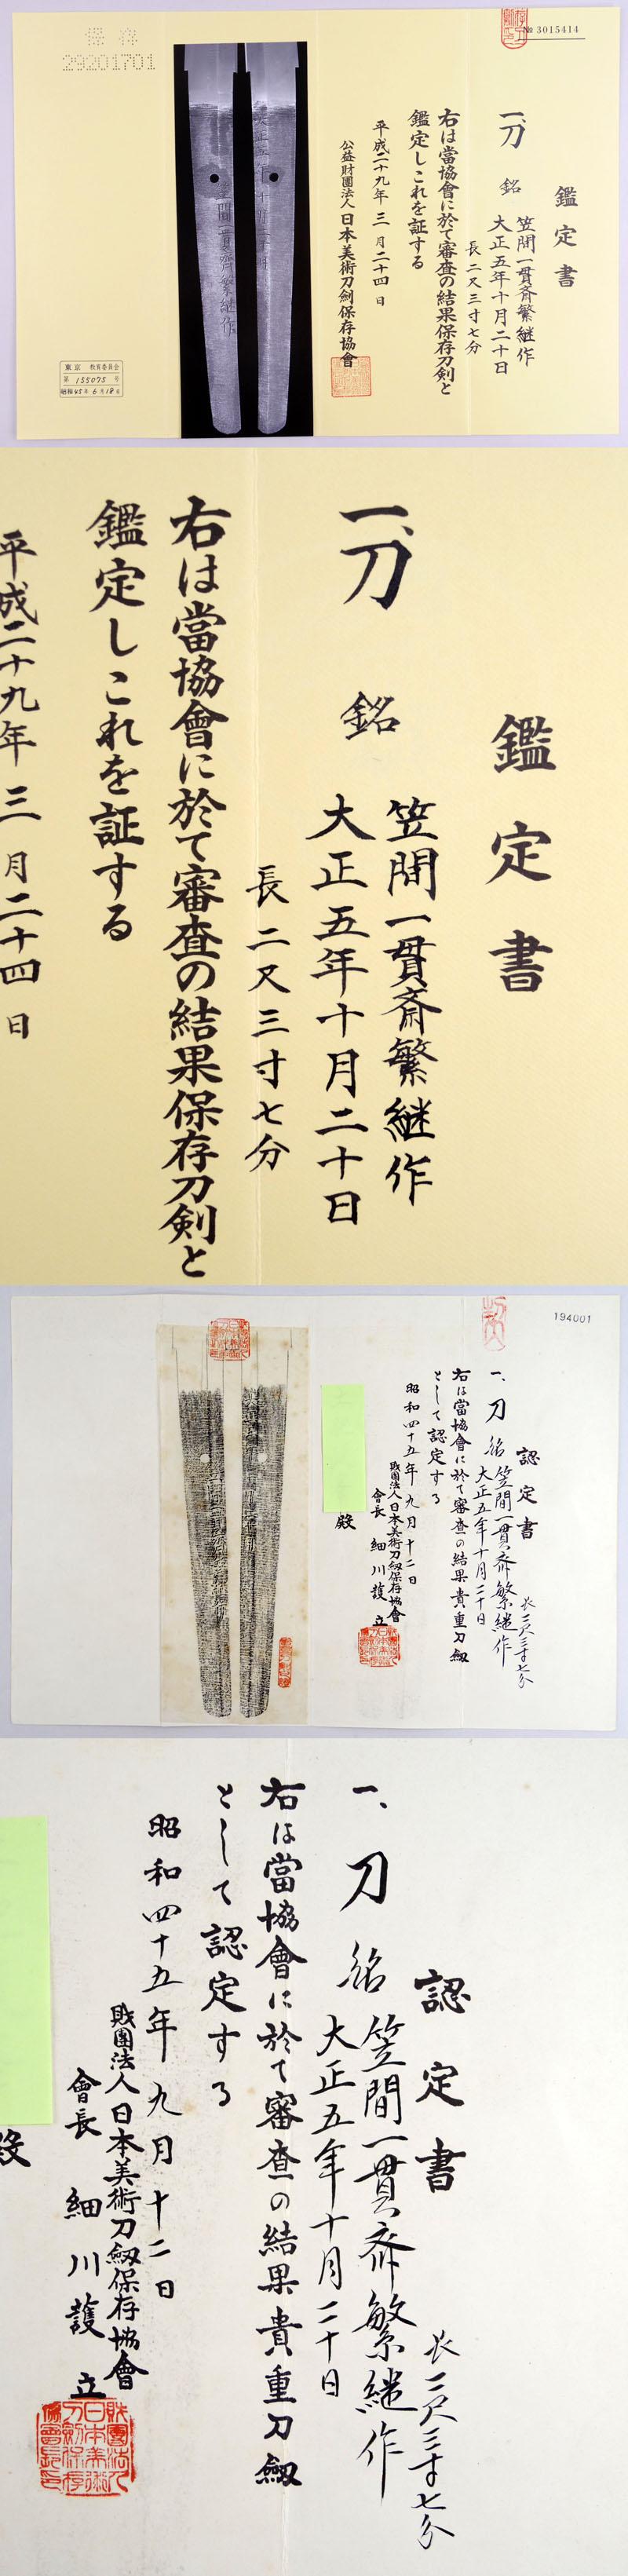 笠間一貫斎繁継作 Picture of Certificate